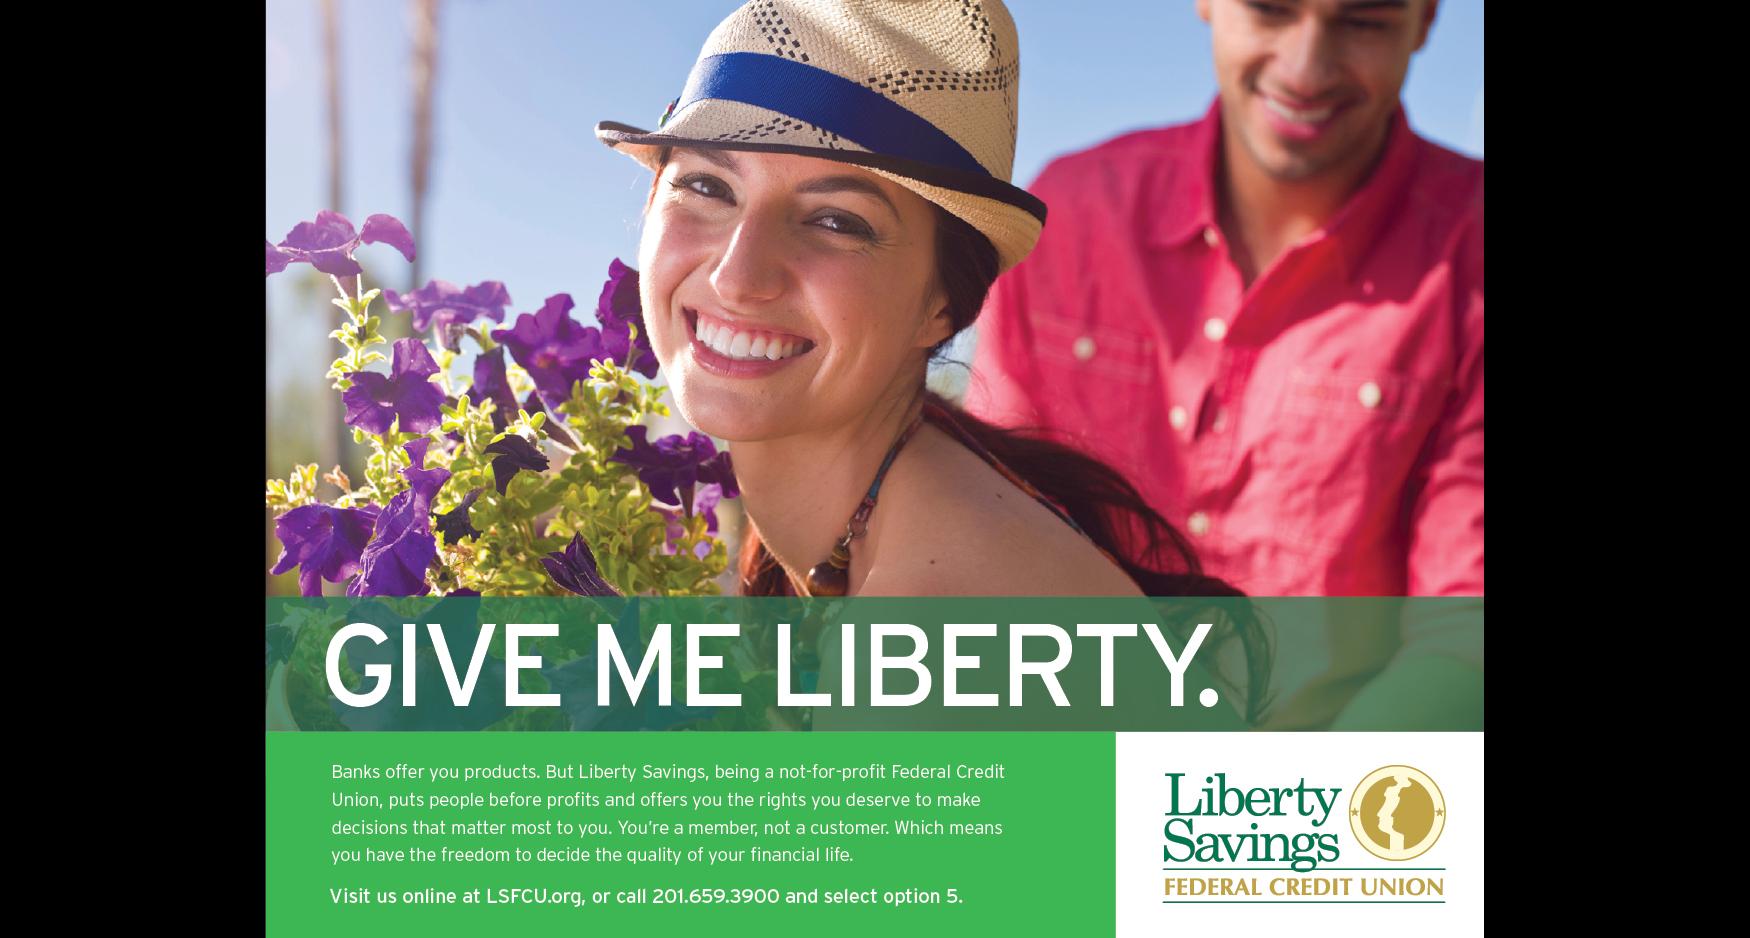 BP Large Website Images17 - LIBERTY SAVINGS - NEIGHBORHOOD SPIRIT CAMPAIGN